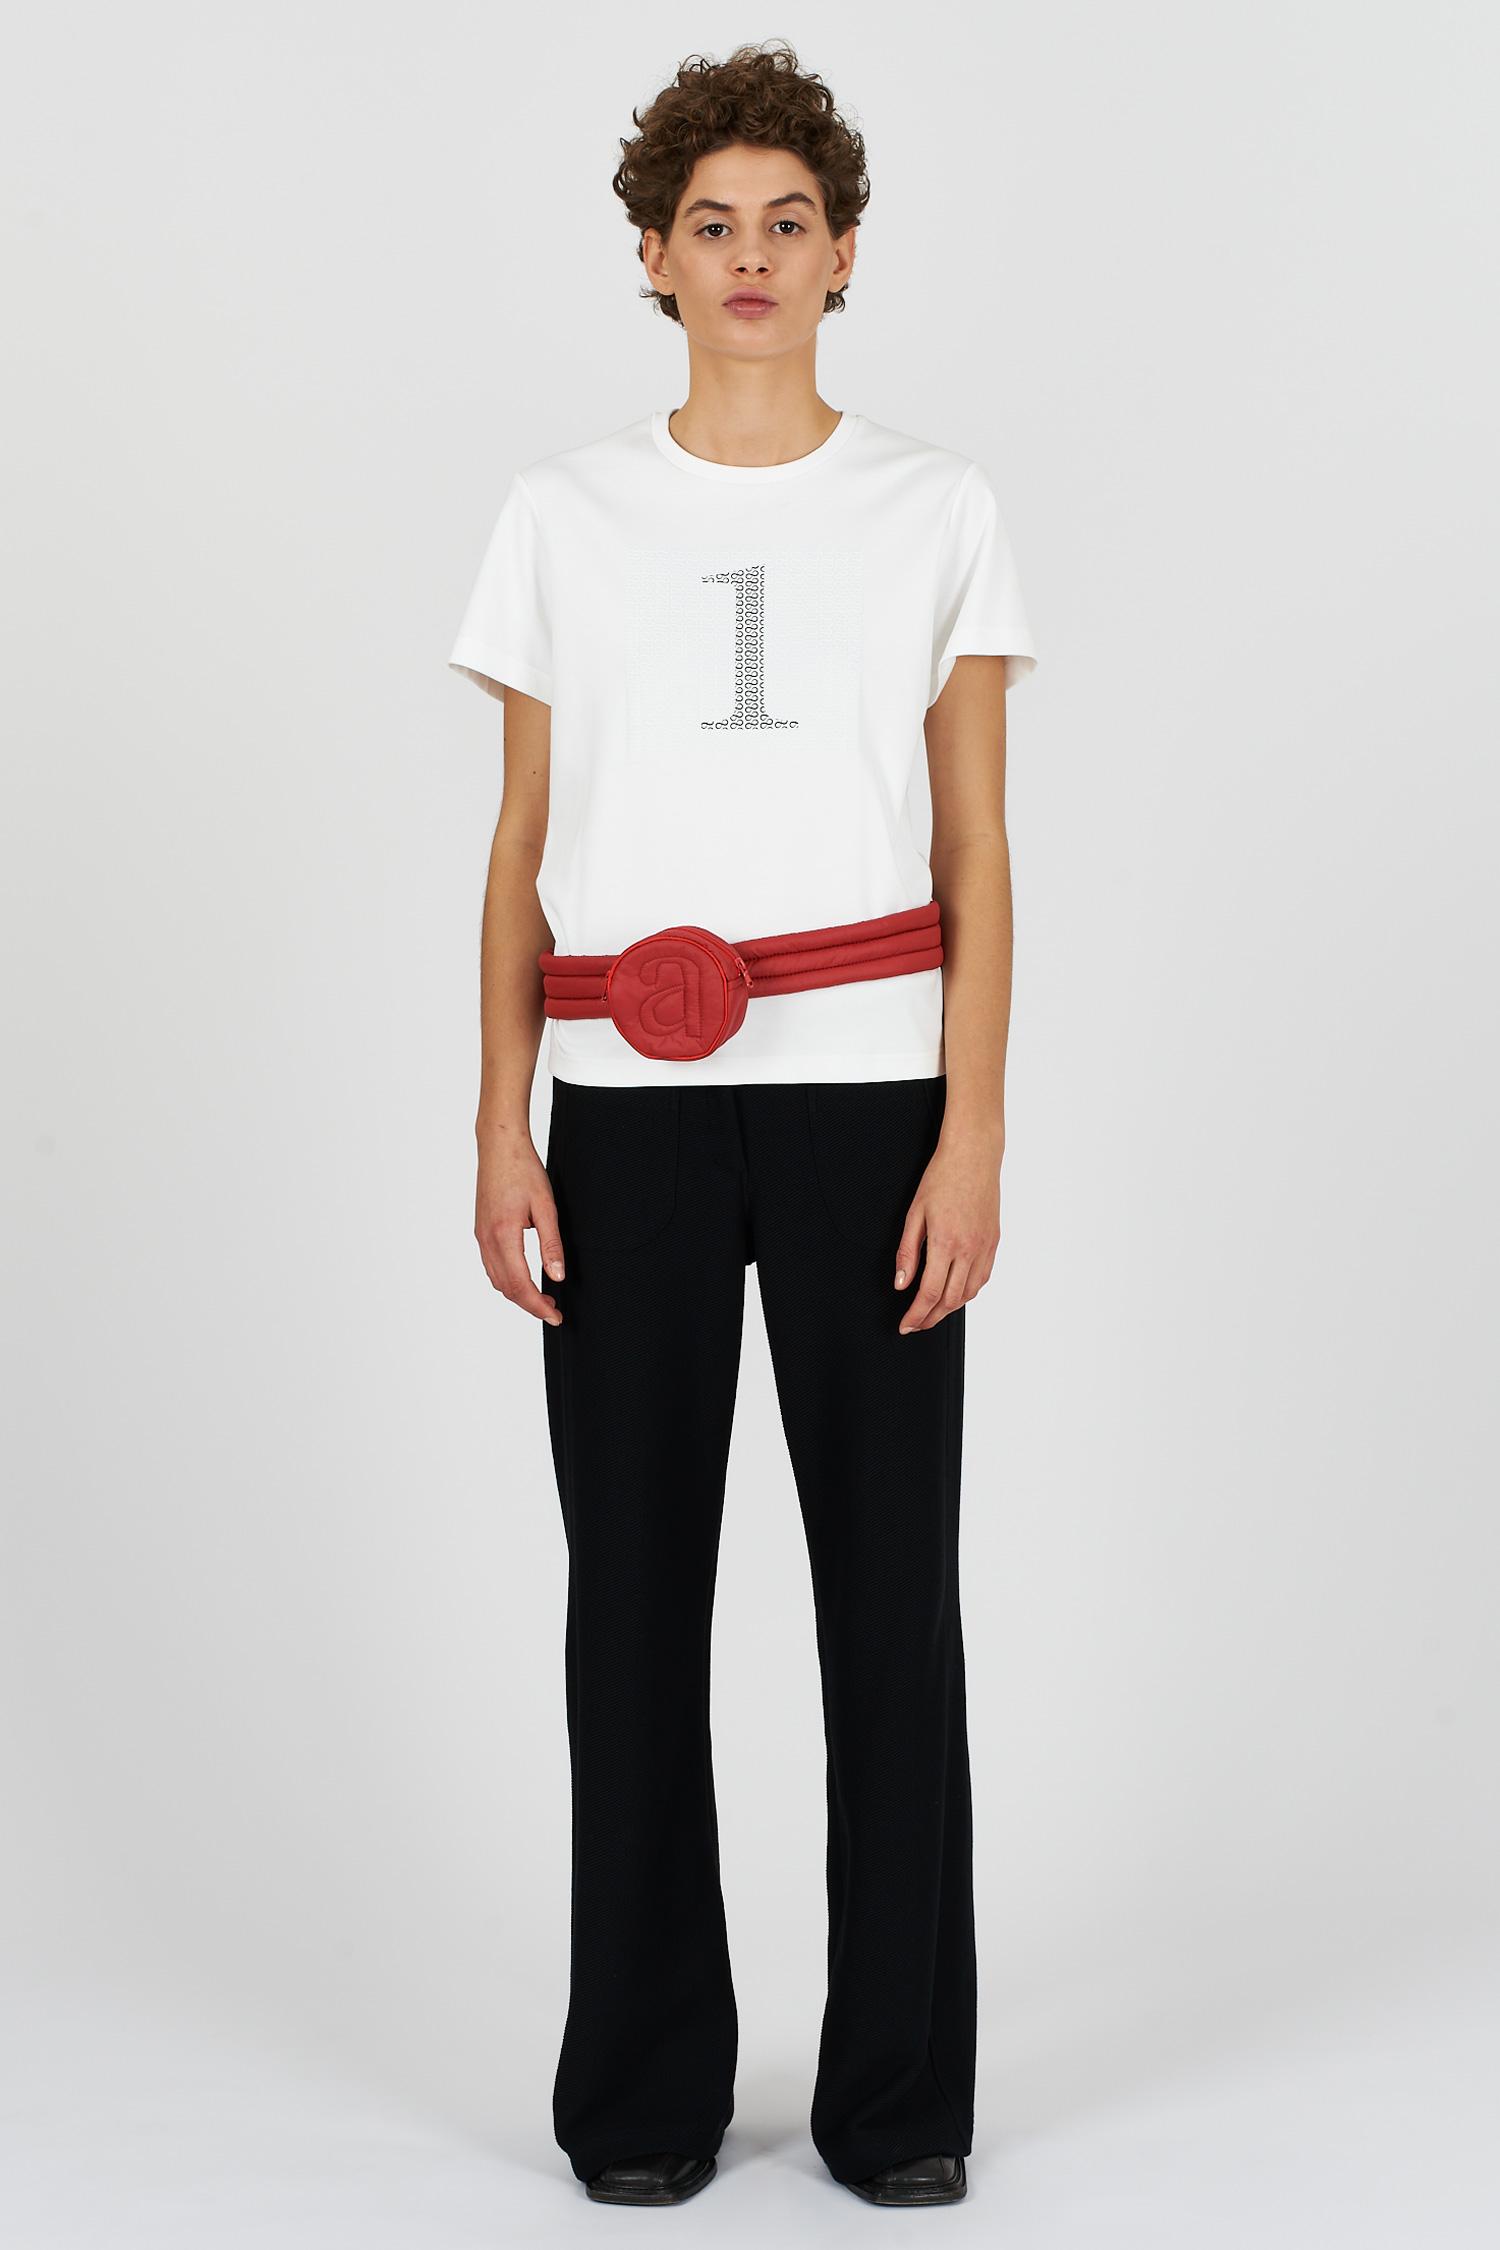 Acephala Fw2021 22 Infinity Print White T Shirt 03